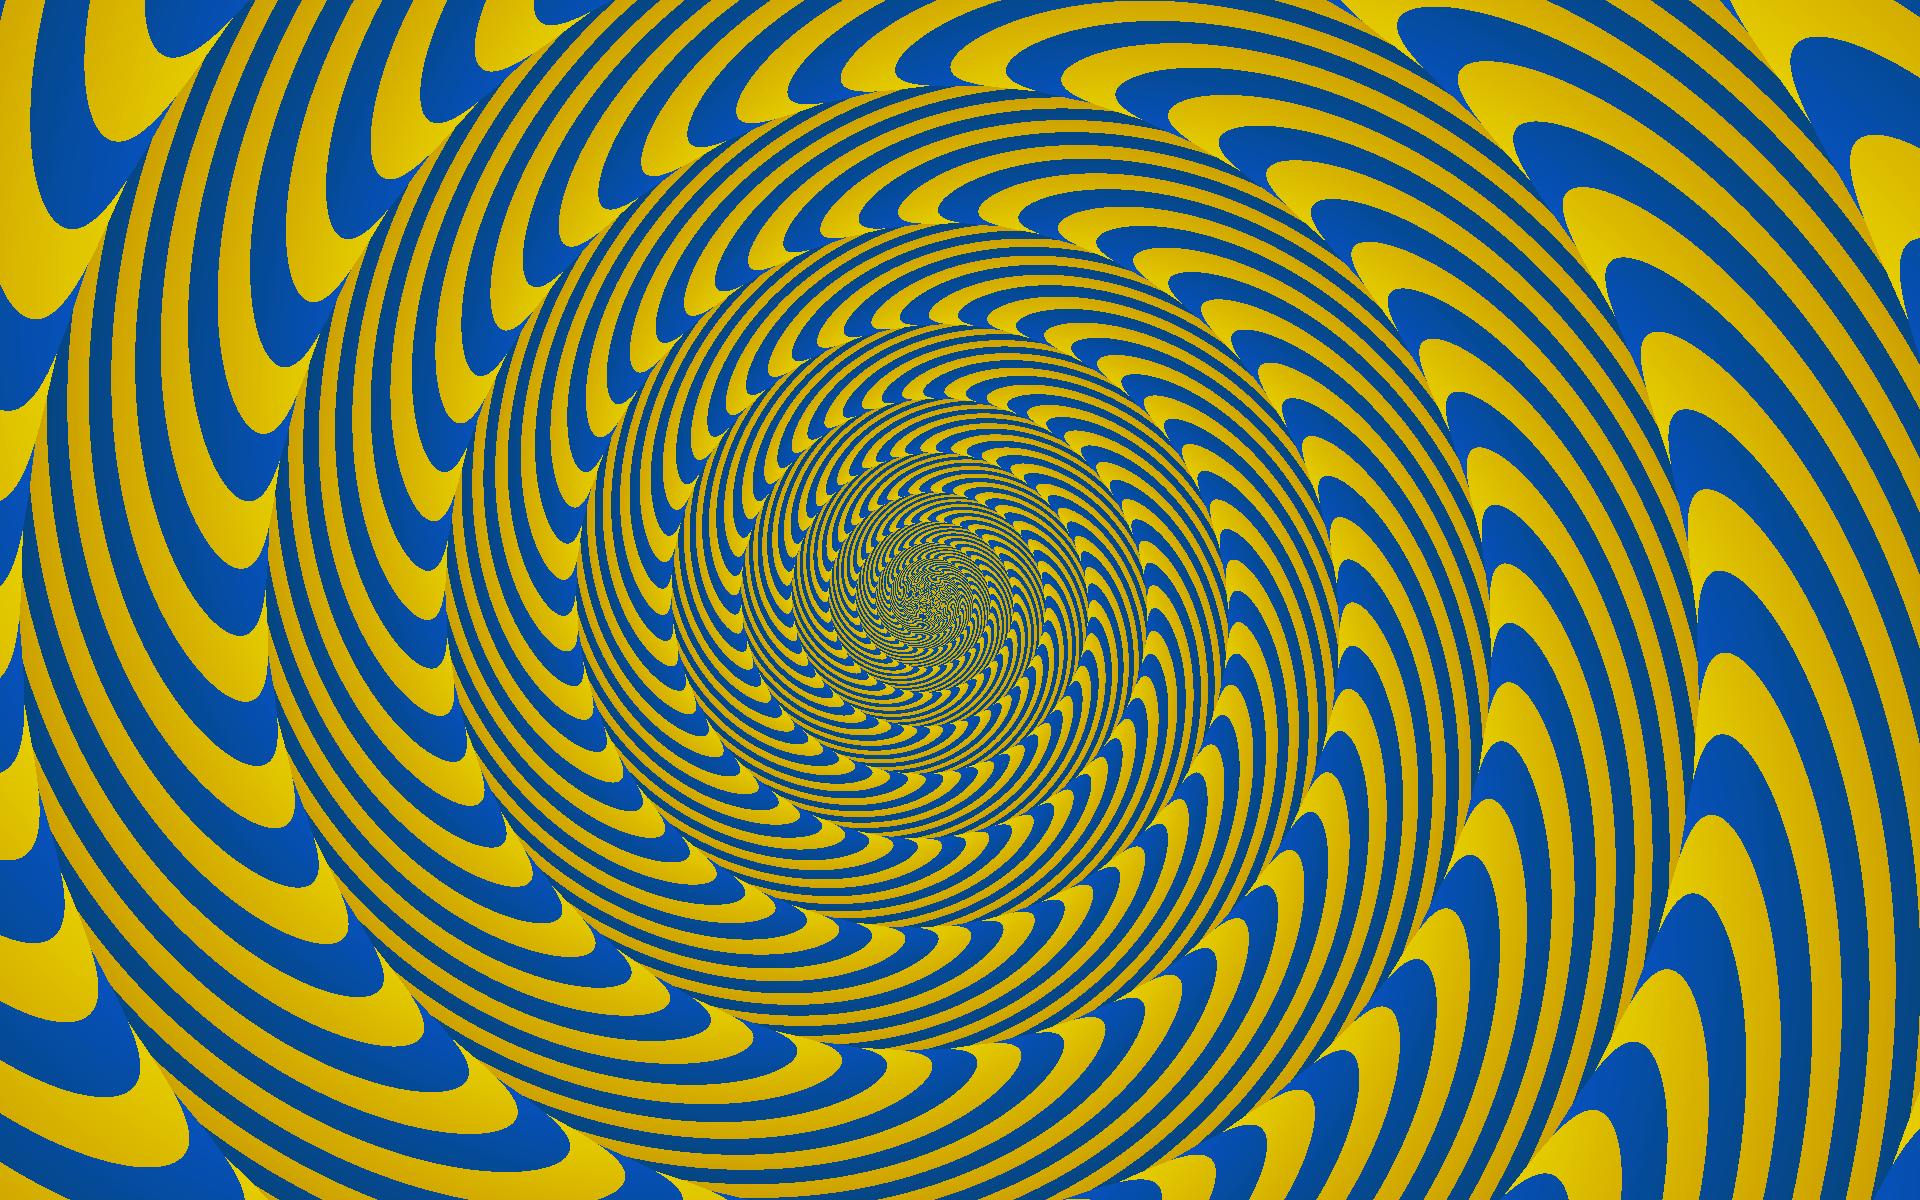 3D illusion Wallpaper 23255